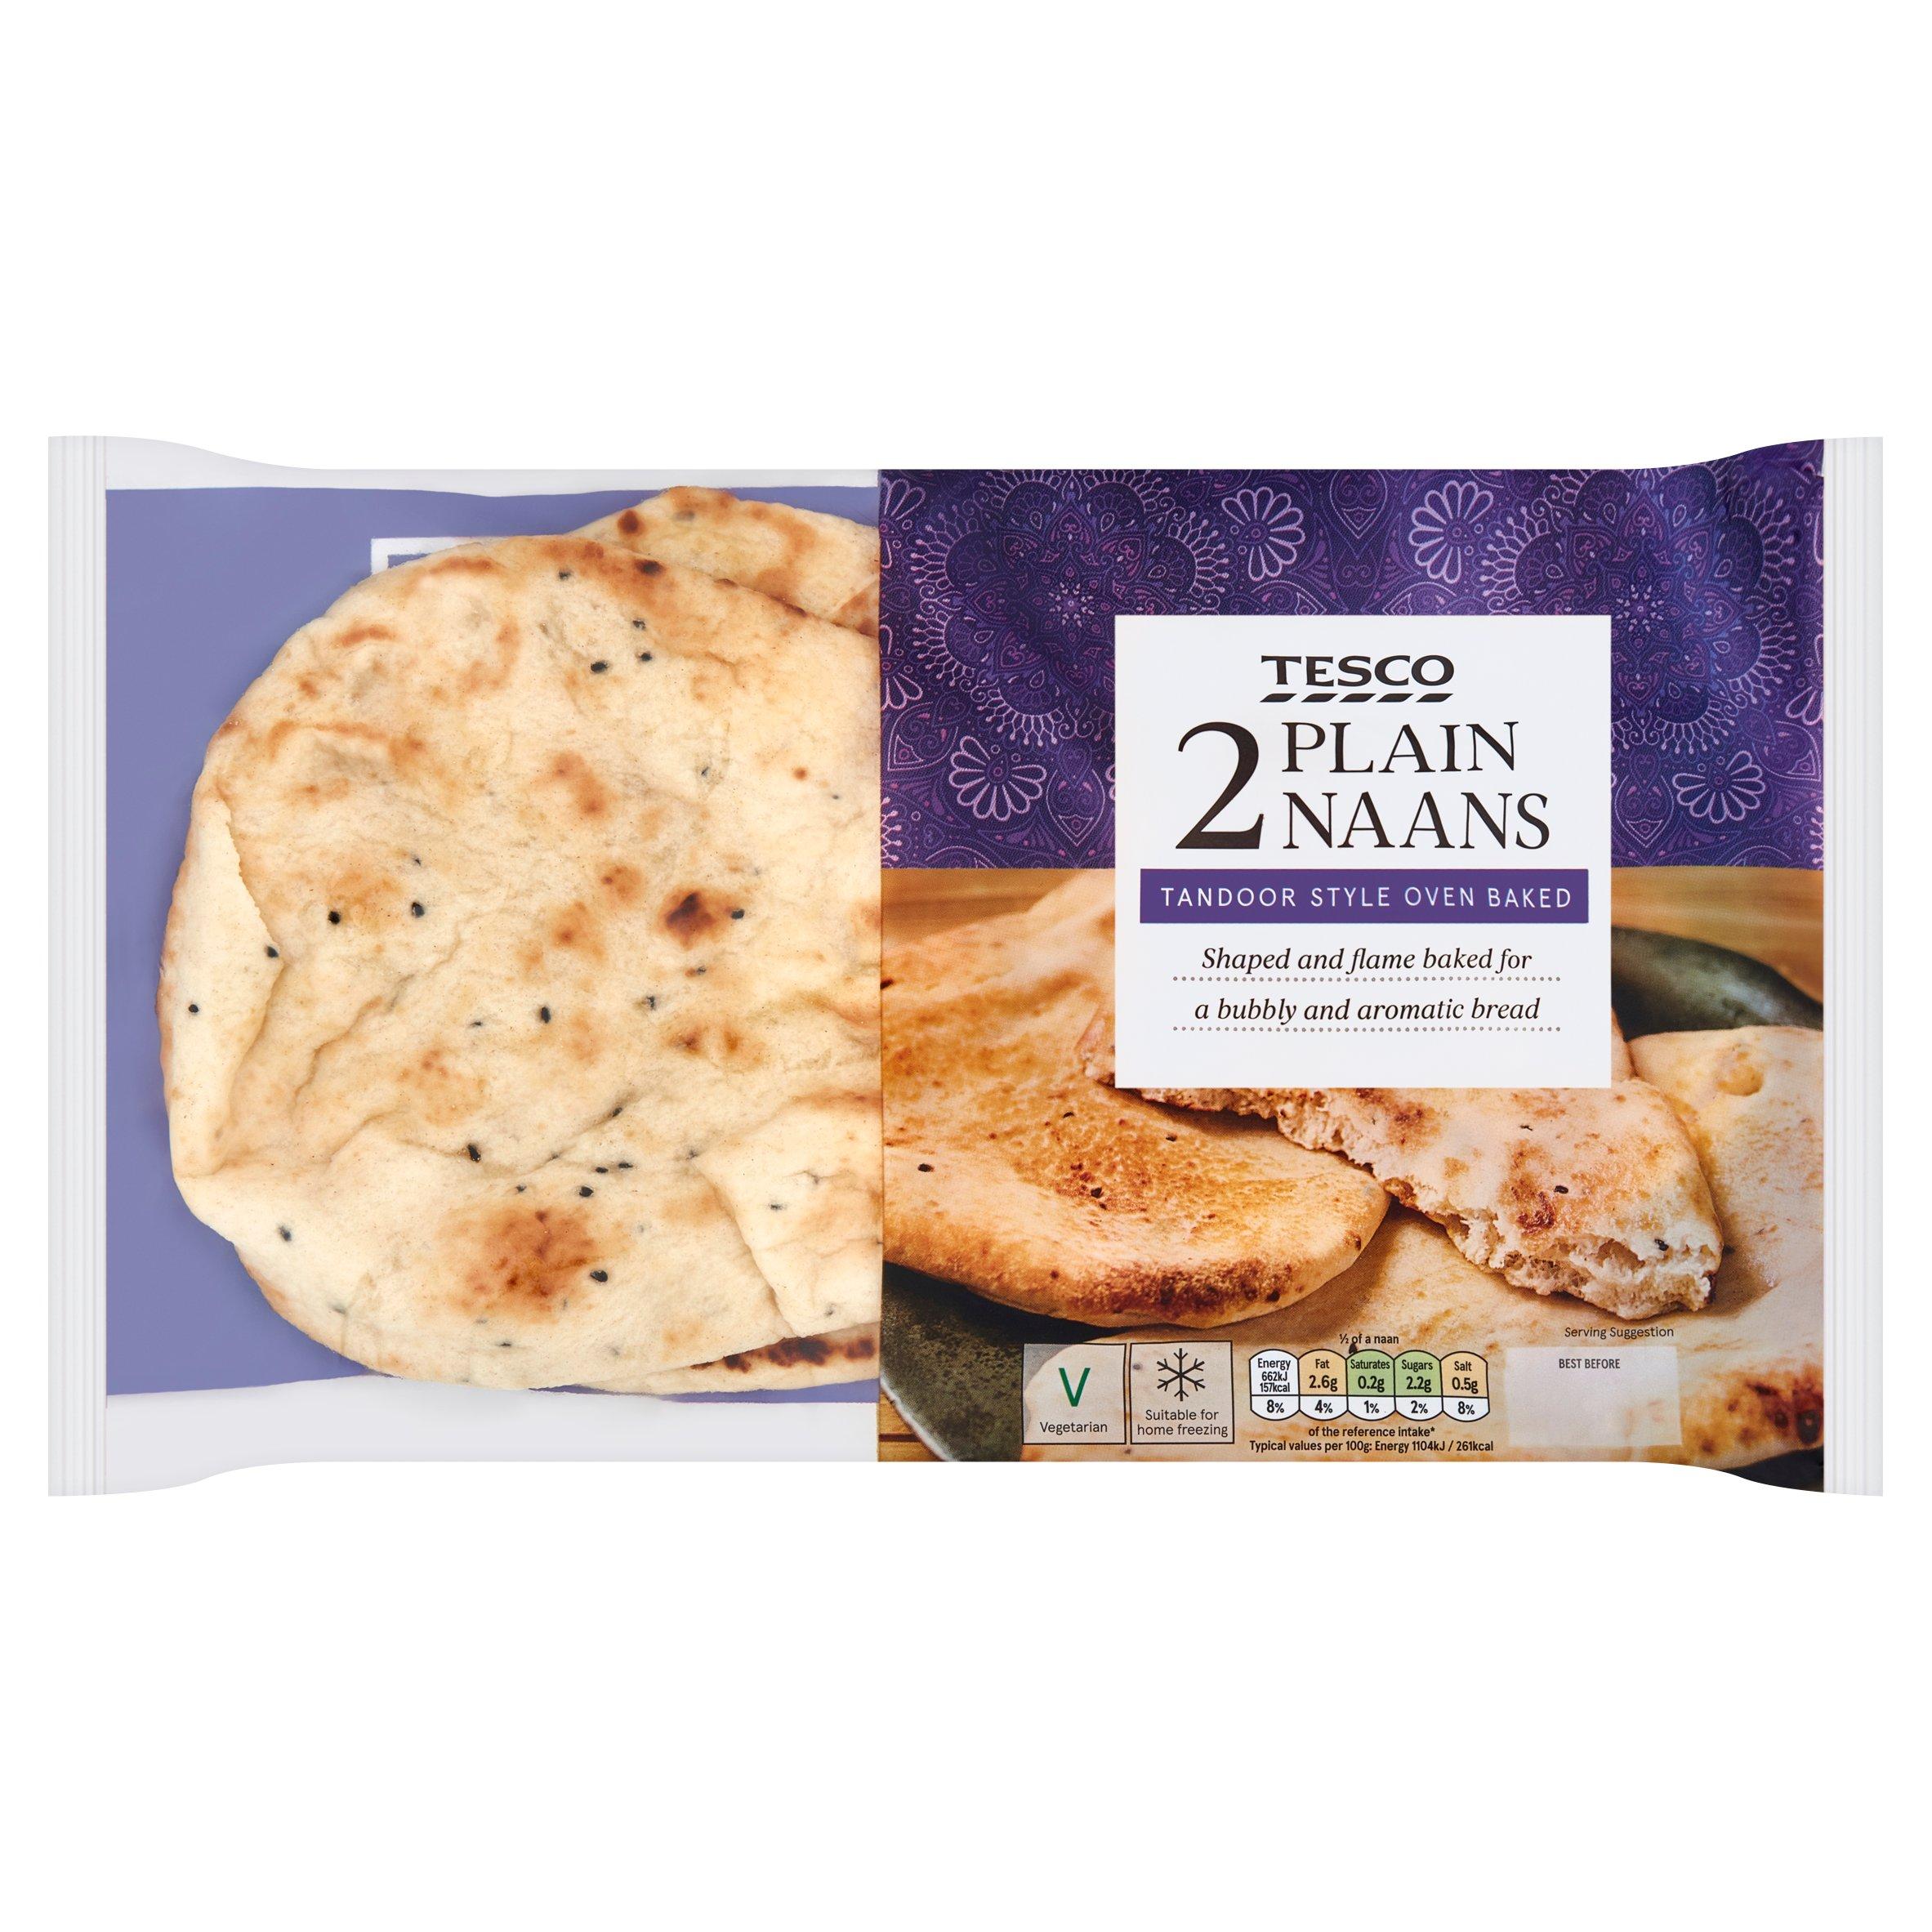 Tesco 2 Plain Naan Breads